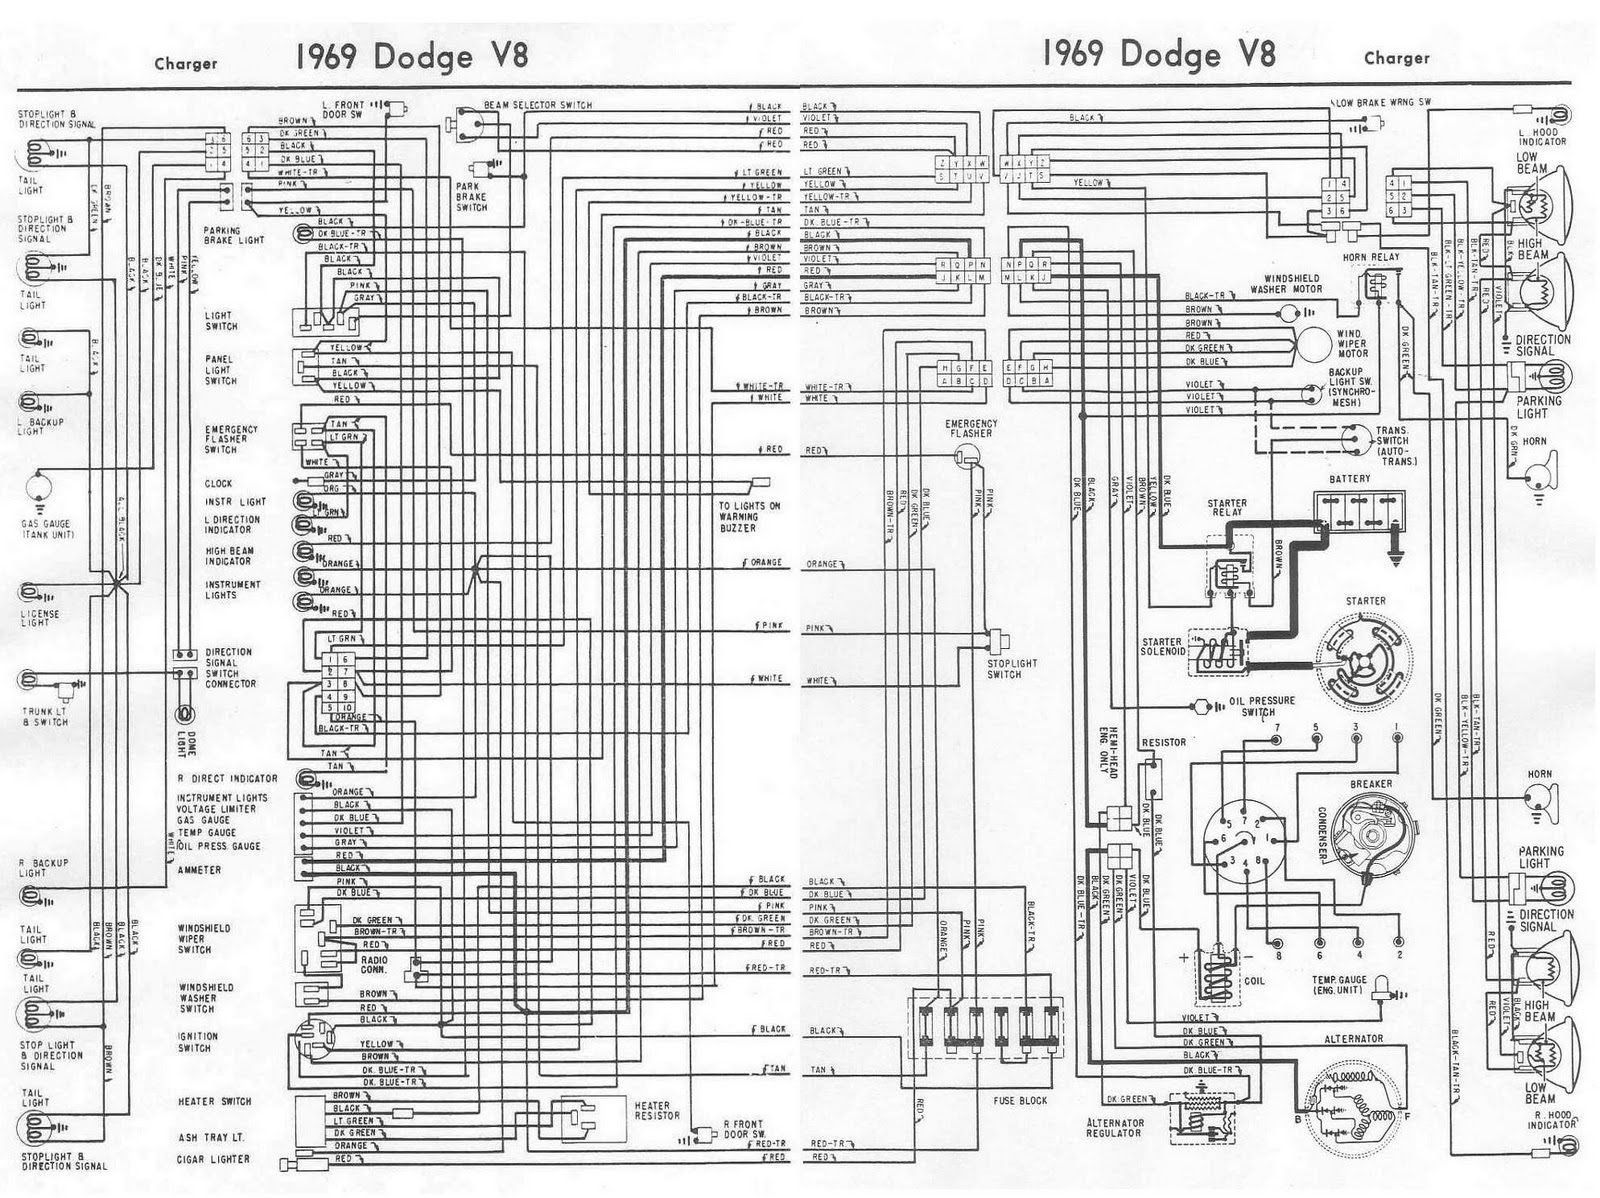 Testing Wiring Airstream Schematics Data Diagrams Wells Cargo Trailer Diagram Schematic Circuit Maker Ezgo